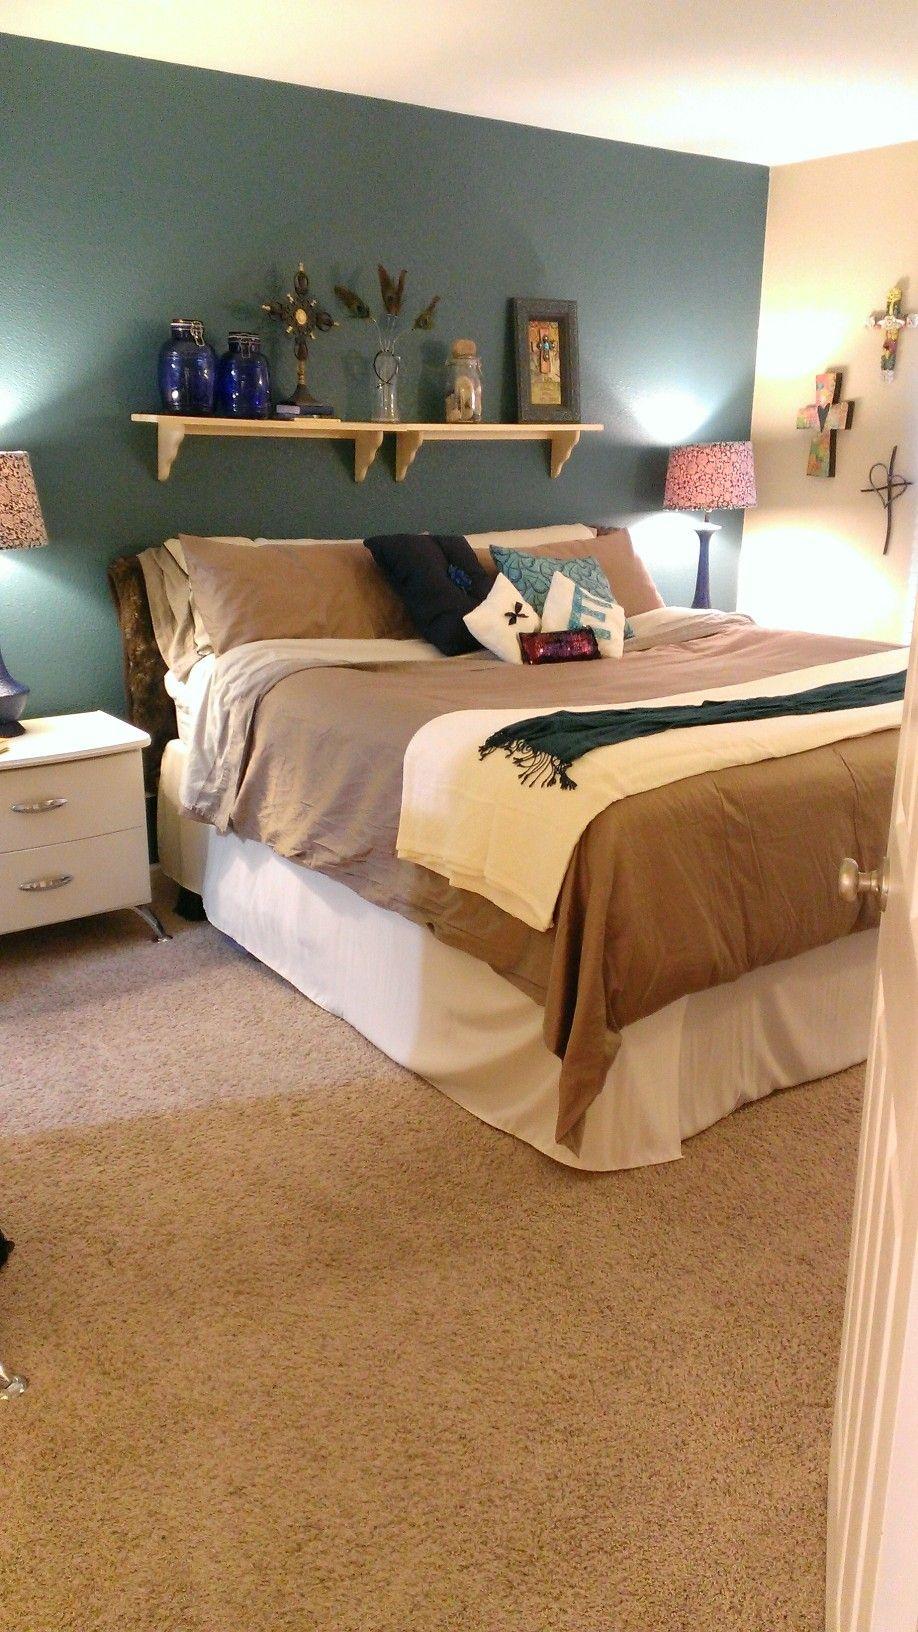 Diy Shelf Headboard diy pillows, shelf headboard | bedroom sanctuary | pinterest